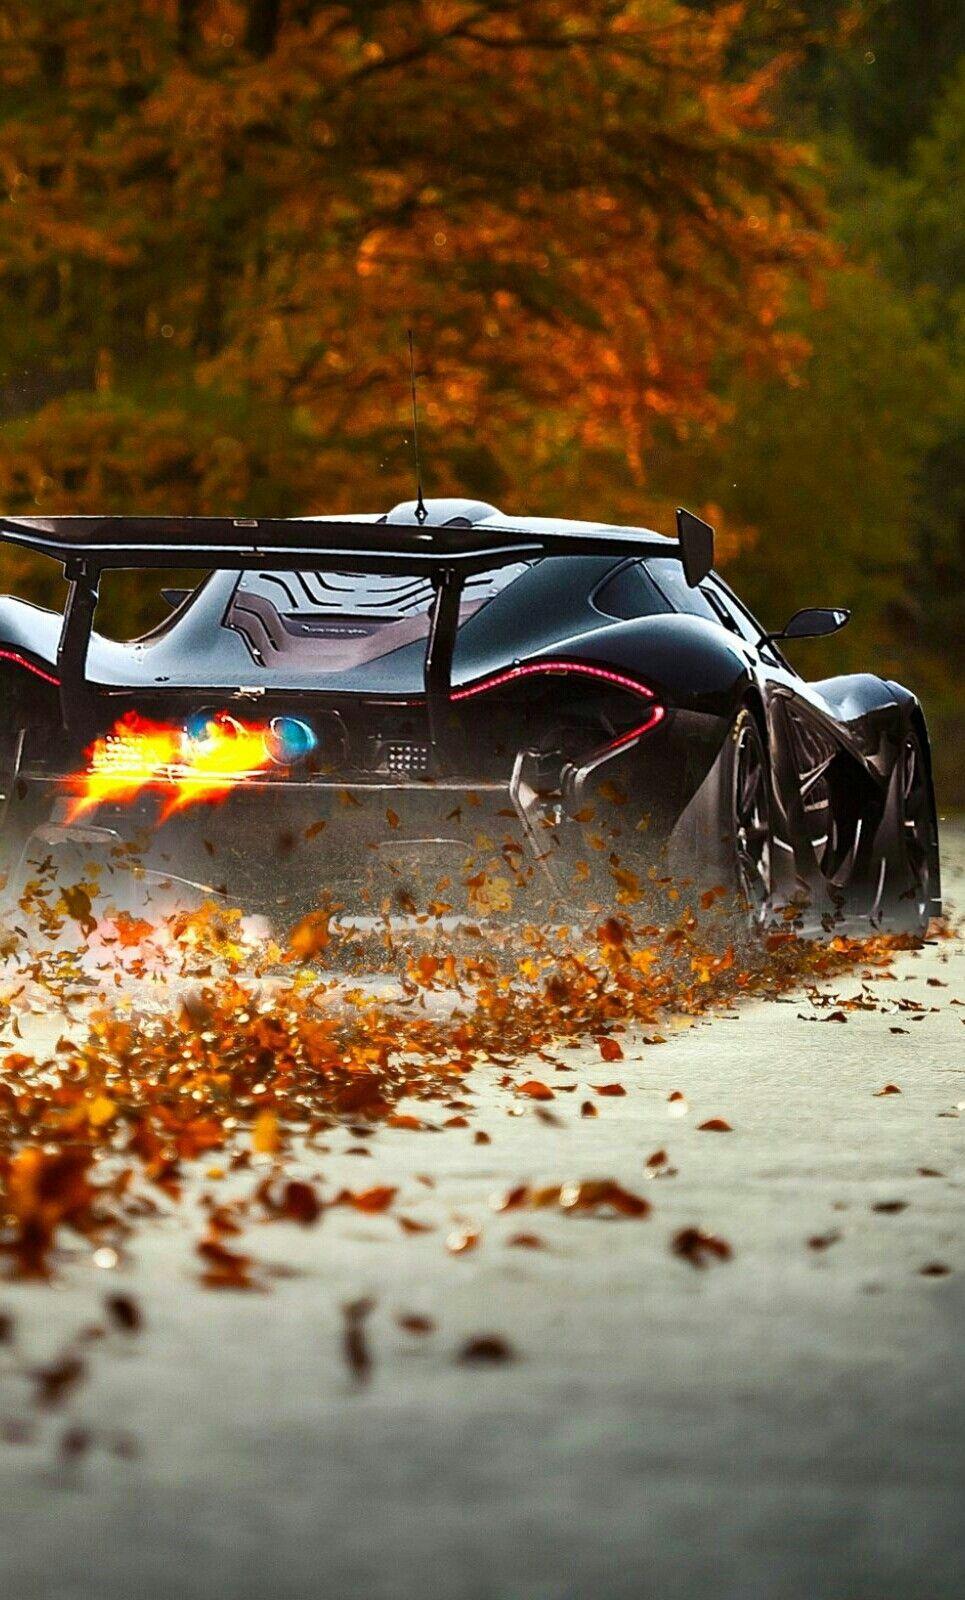 Mclaren P1 Gtr By Levon Sports Cars Luxury Sports Car Wallpaper Super Sport Cars